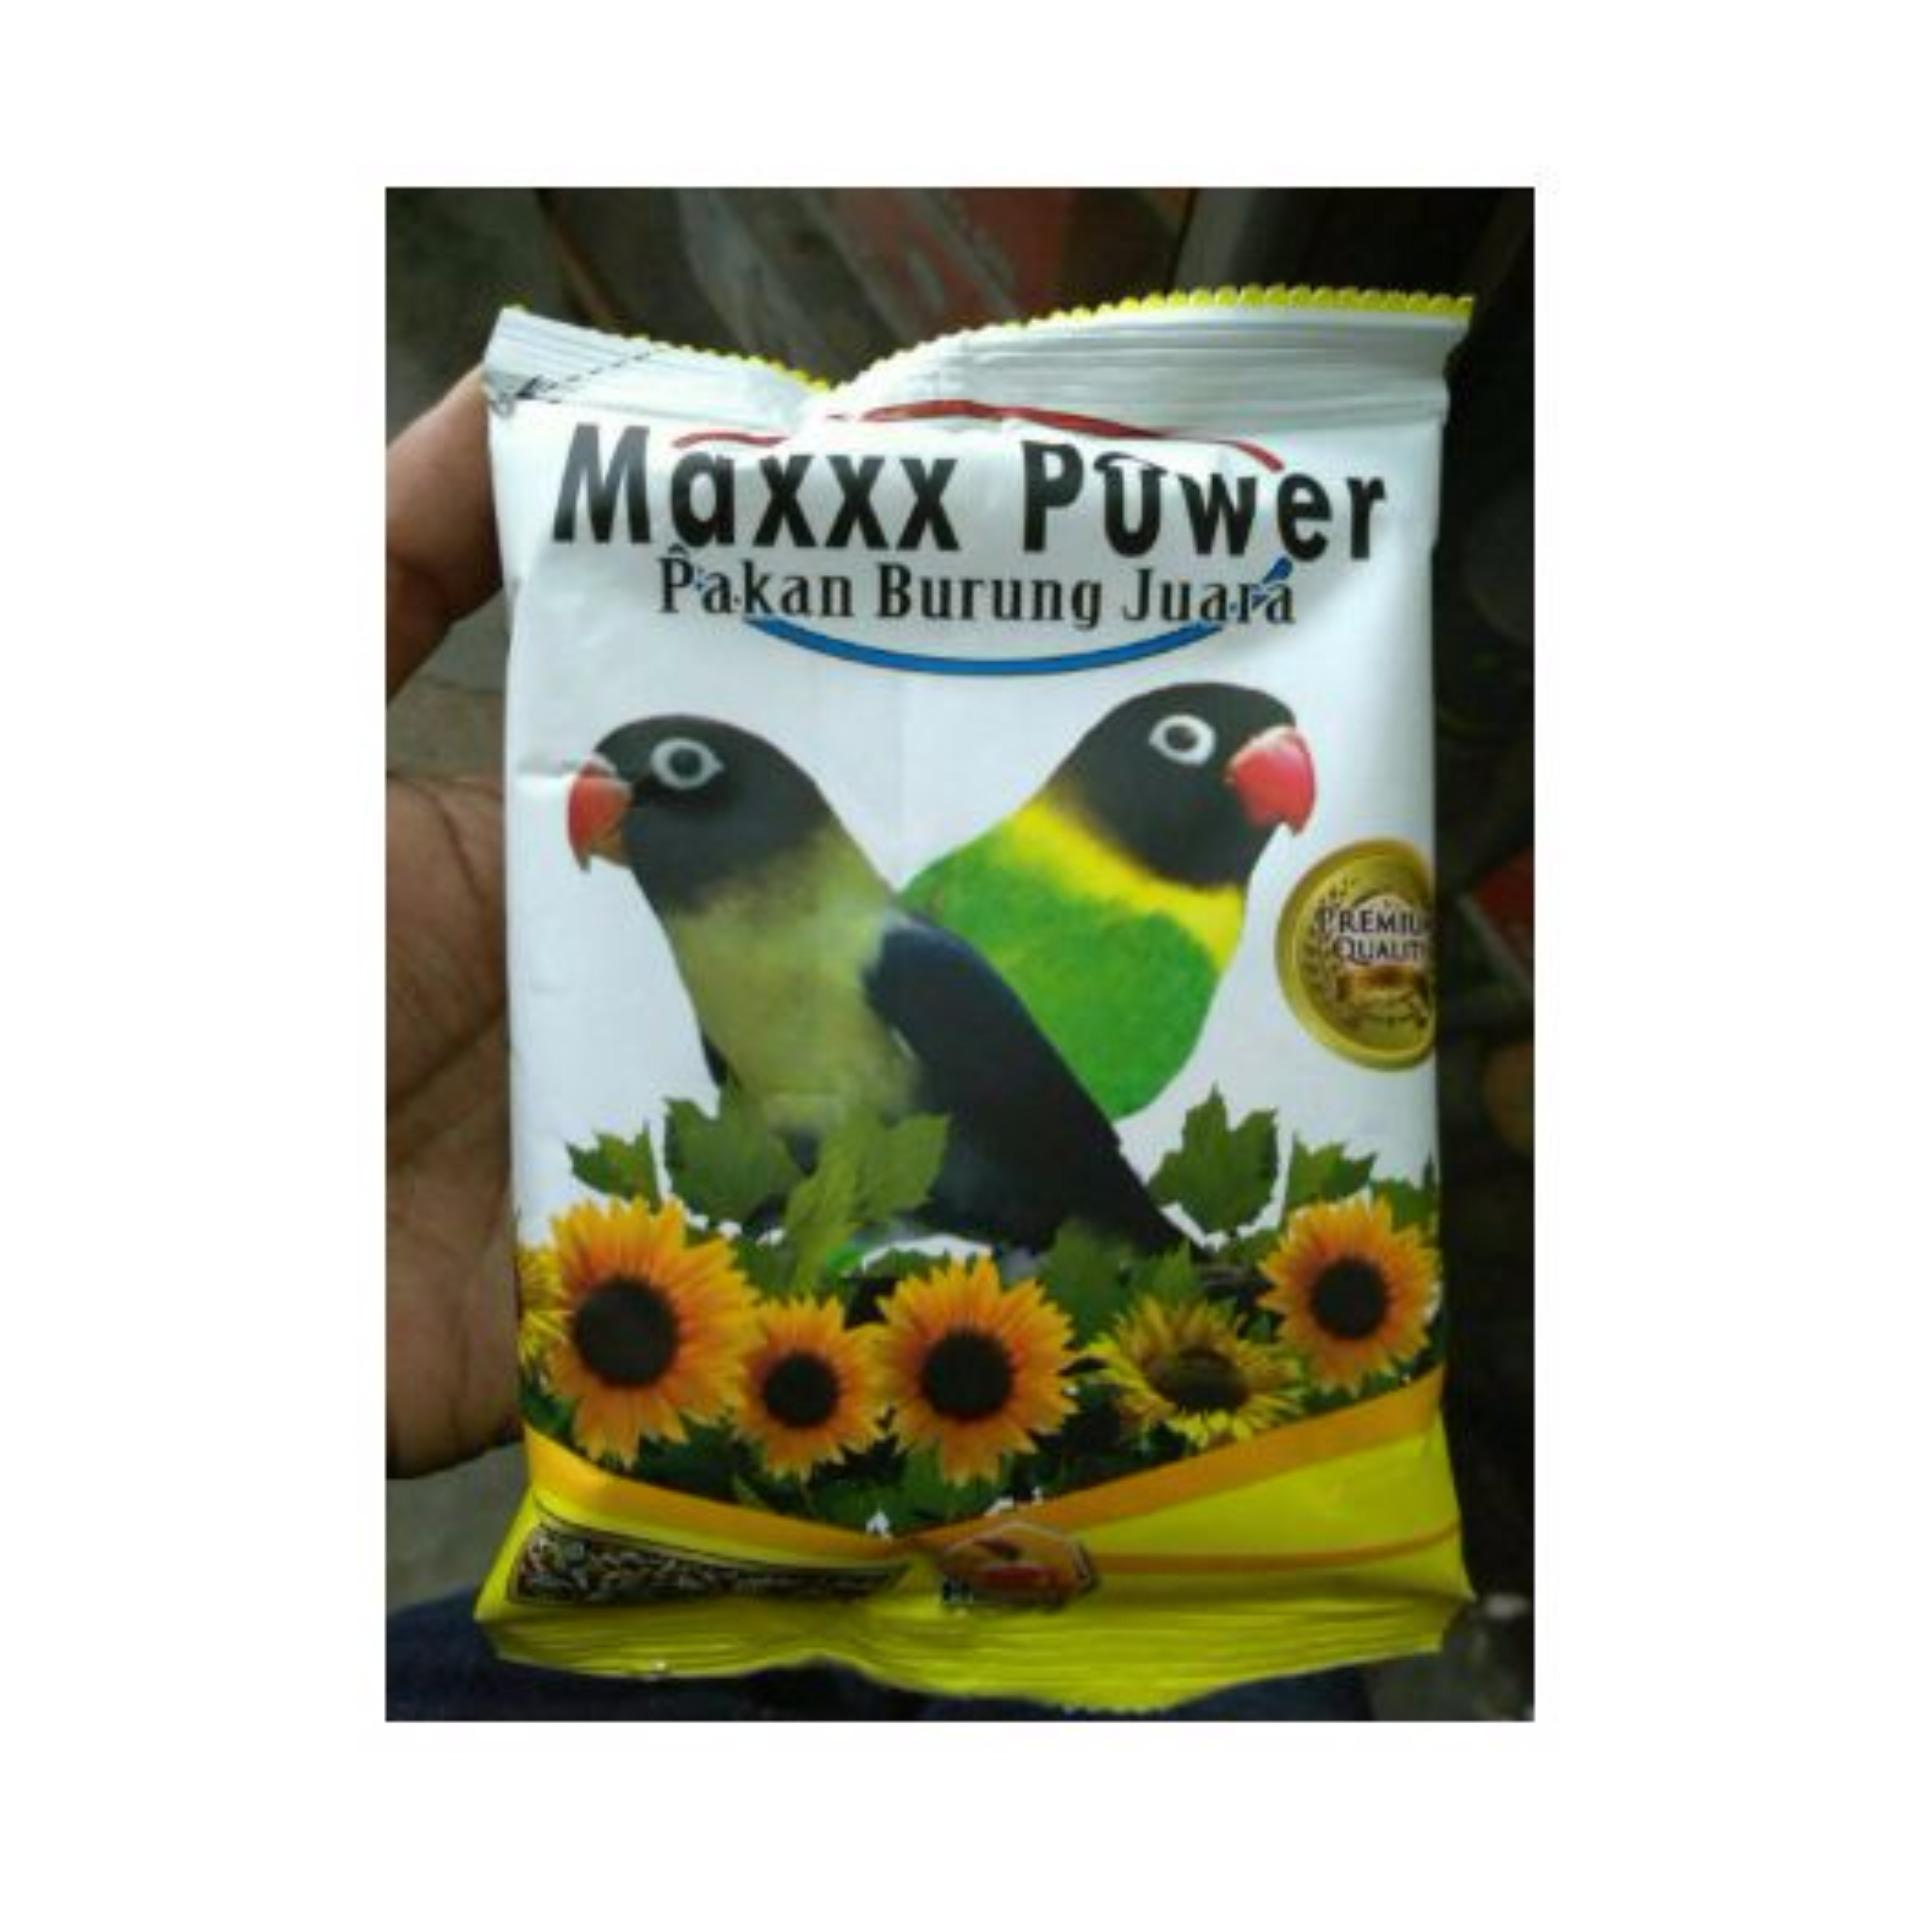 Home; Persediaan hewan; Burung. Maxxx Power Lovebird; Maxxx Power Lovebird ...